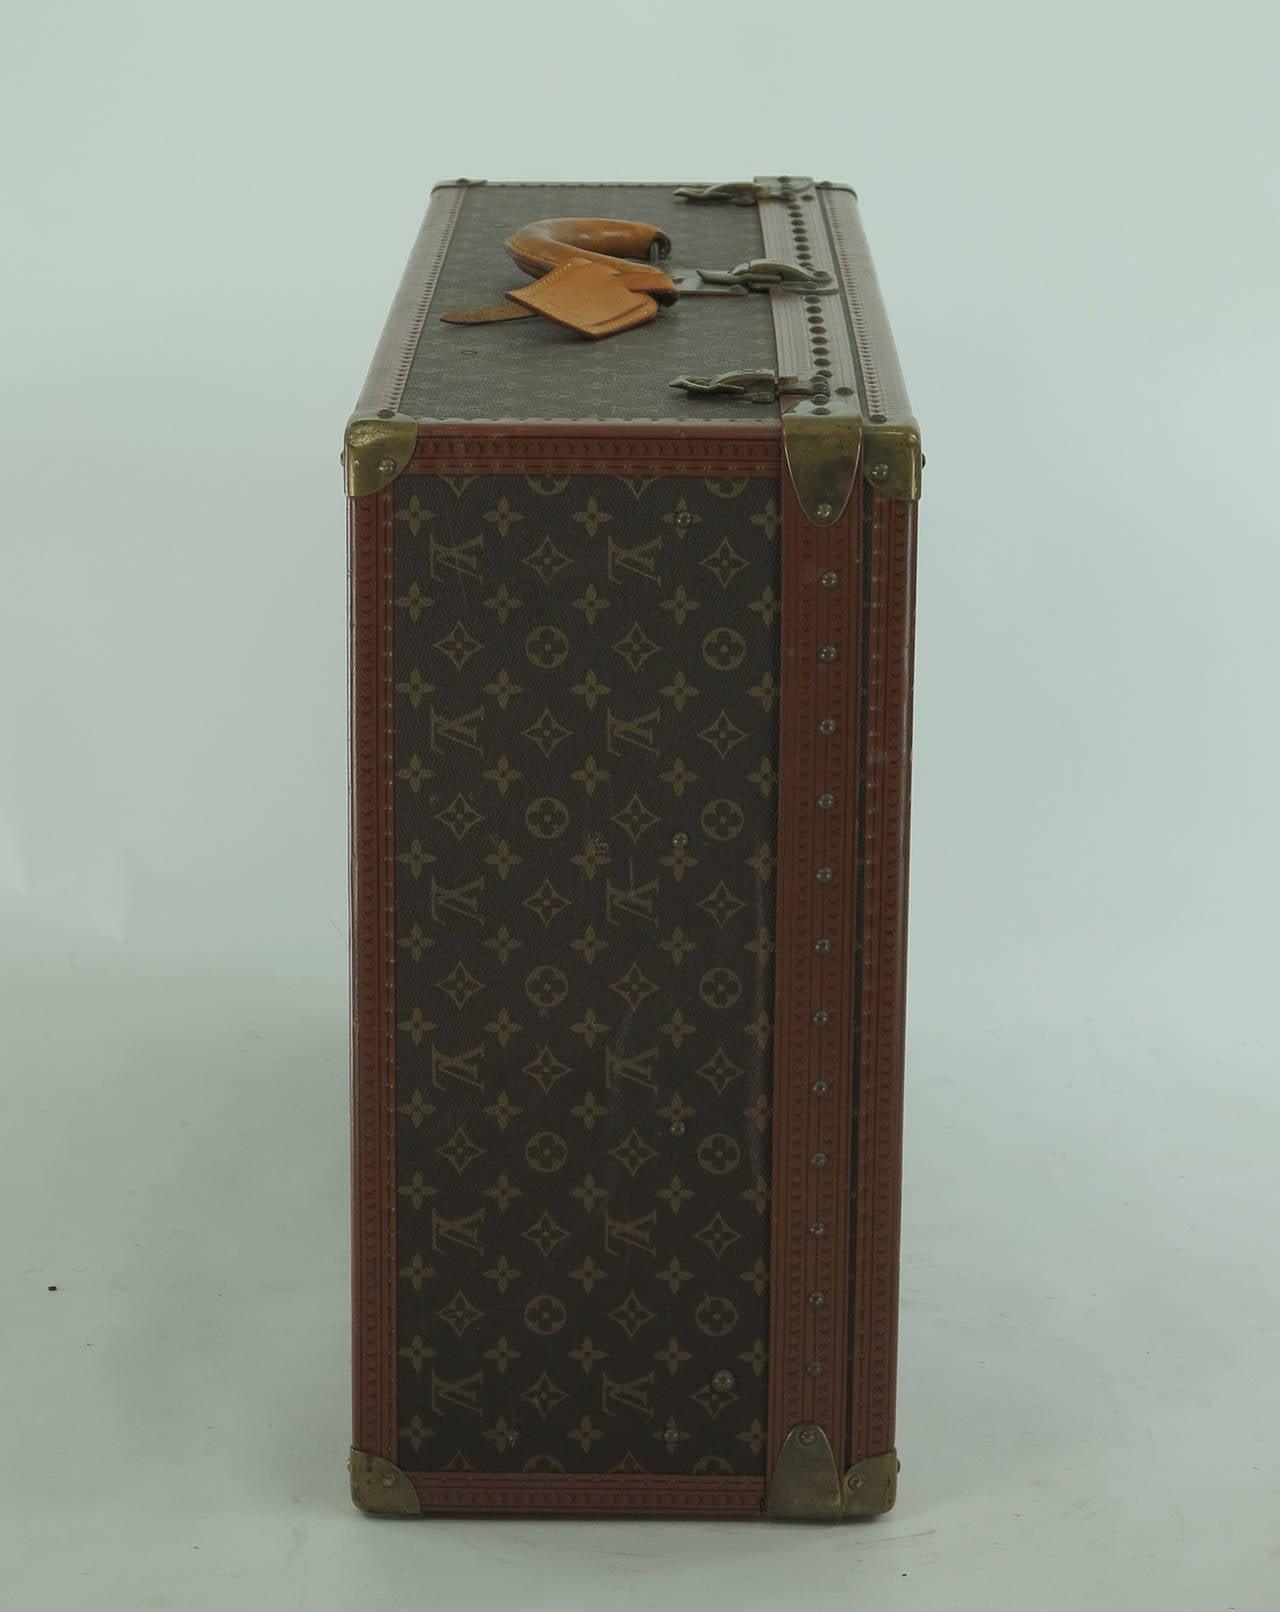 Louis Vuitton Alzar 80 monogram hardside suitcase/trunk 2